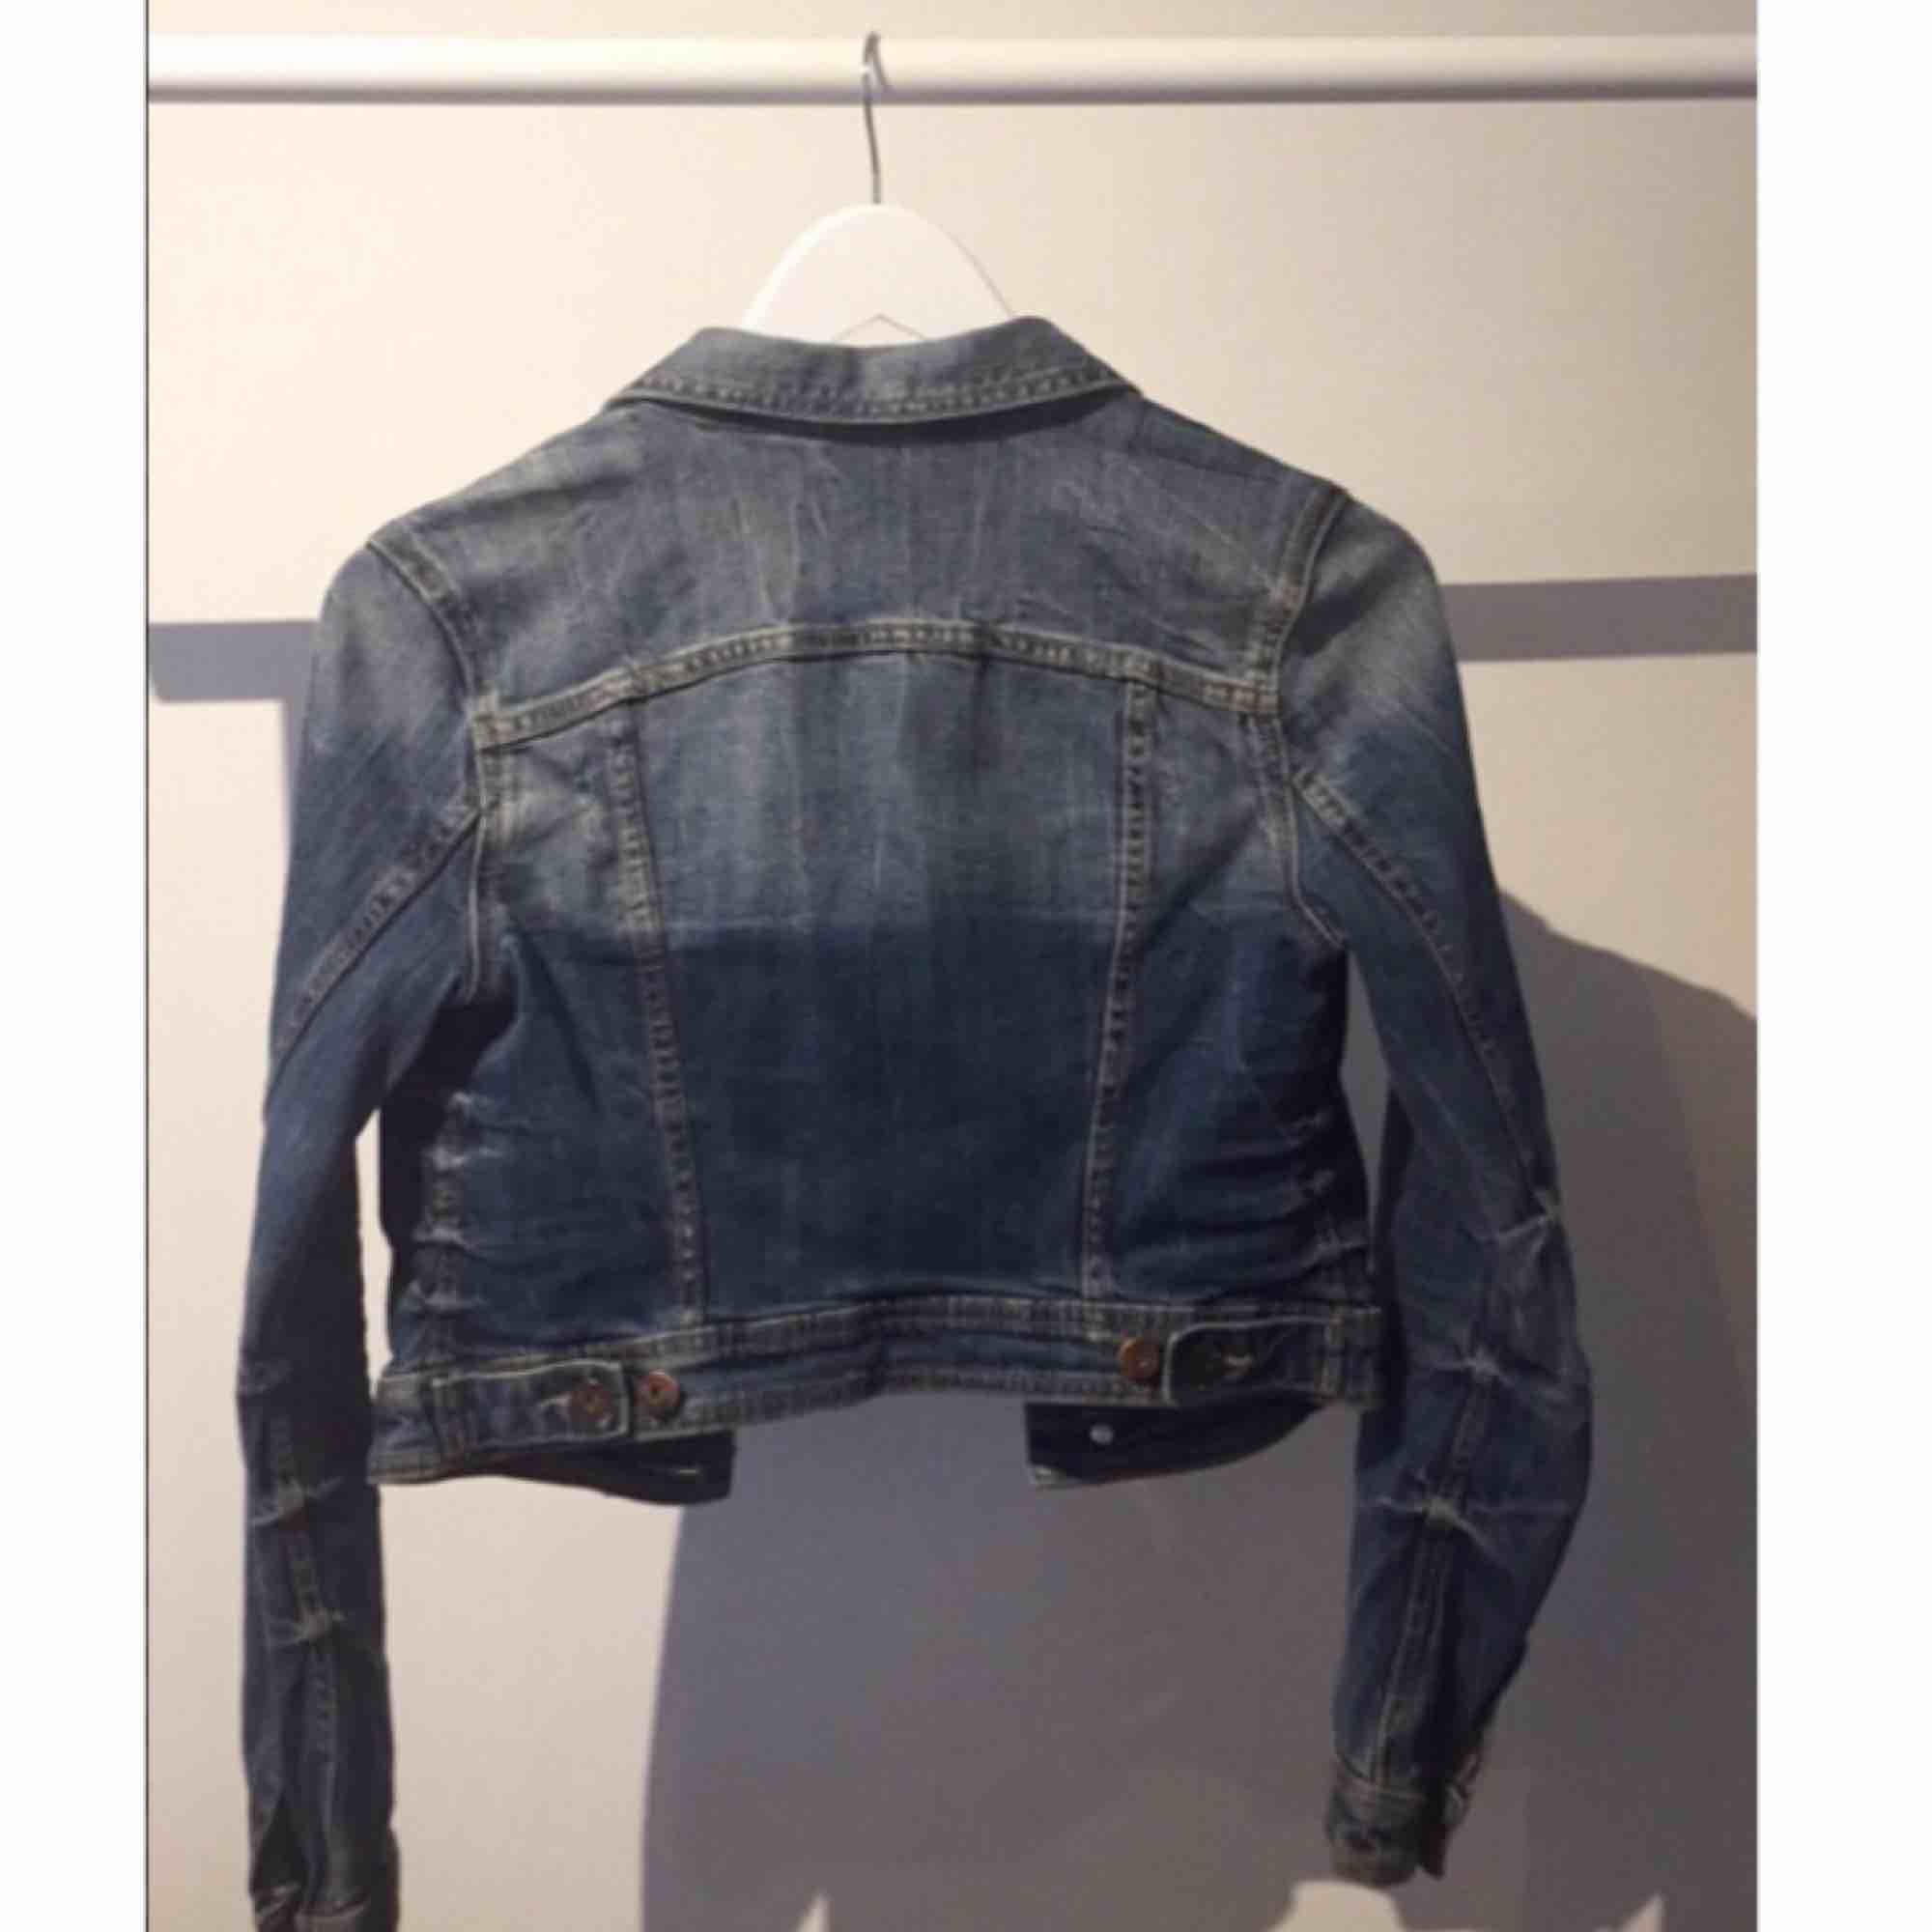 Fräsch figursydd lite croppad jeansjacka i storlek 34. Jackor.